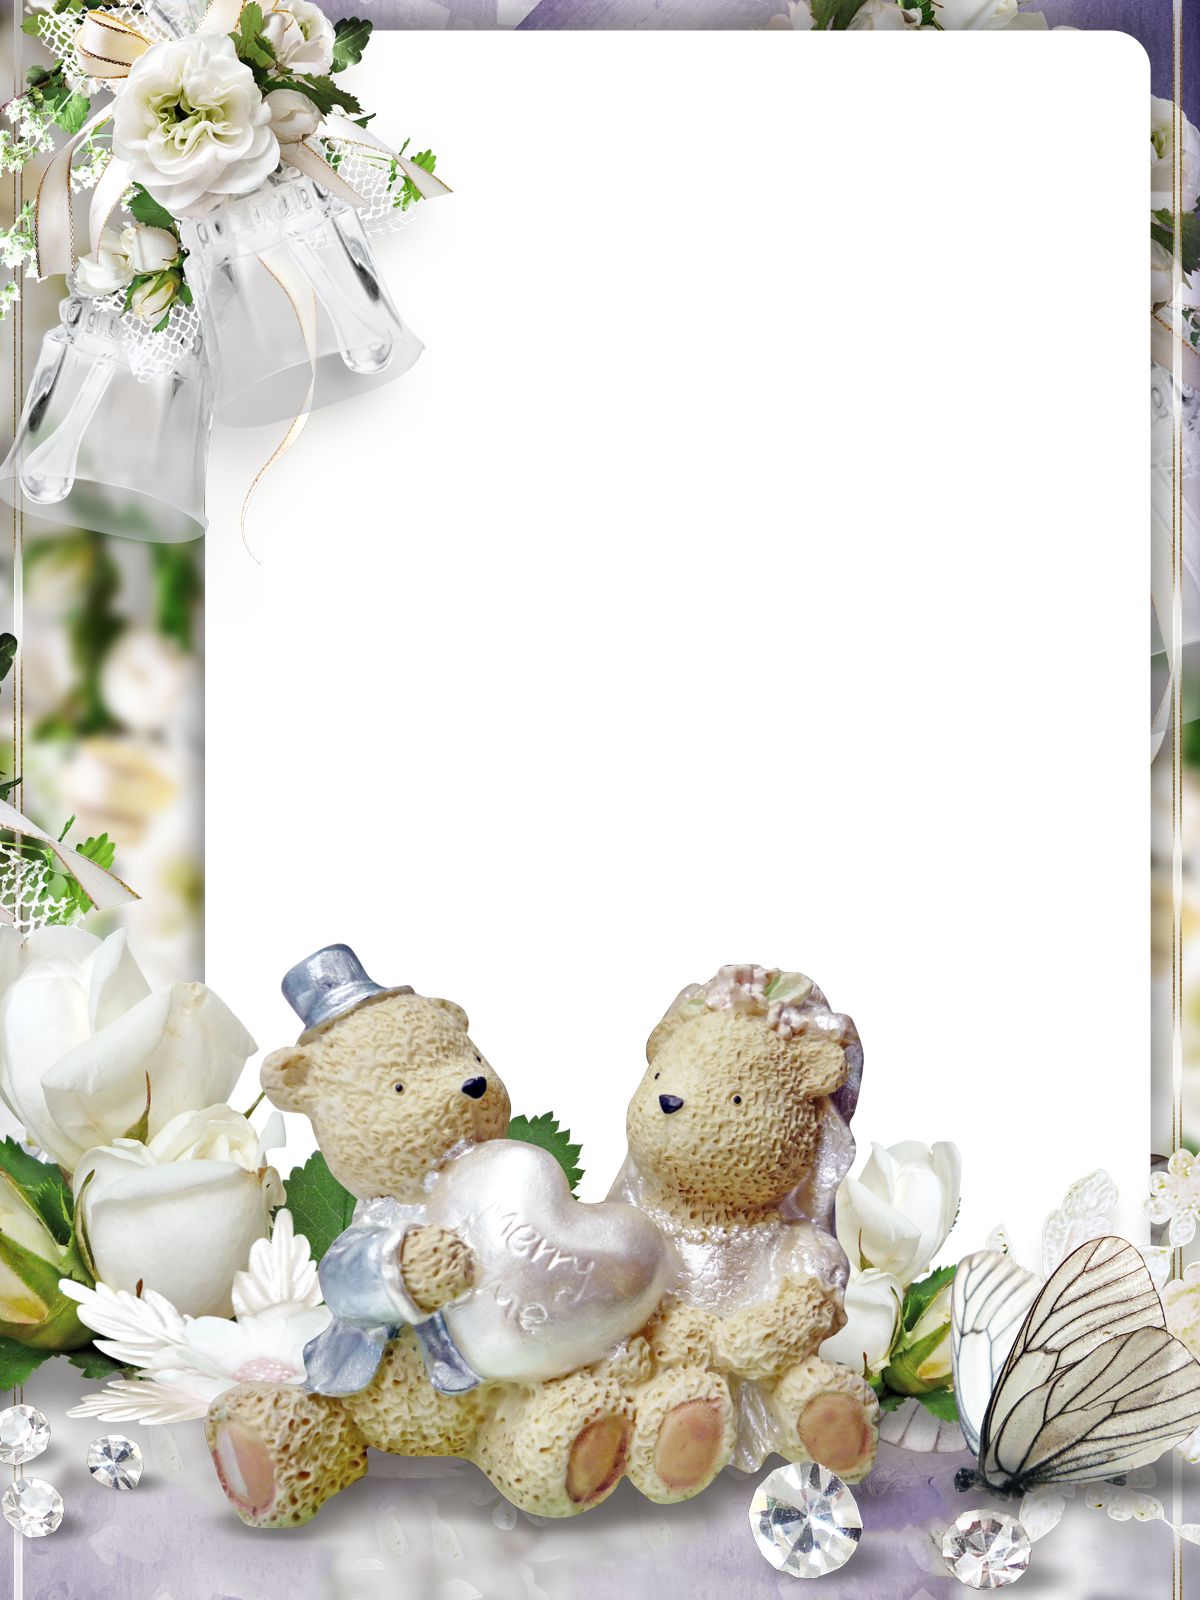 Фоторамка Винтажные мишки Фоторамка для фотошопа, PNG шаблон.